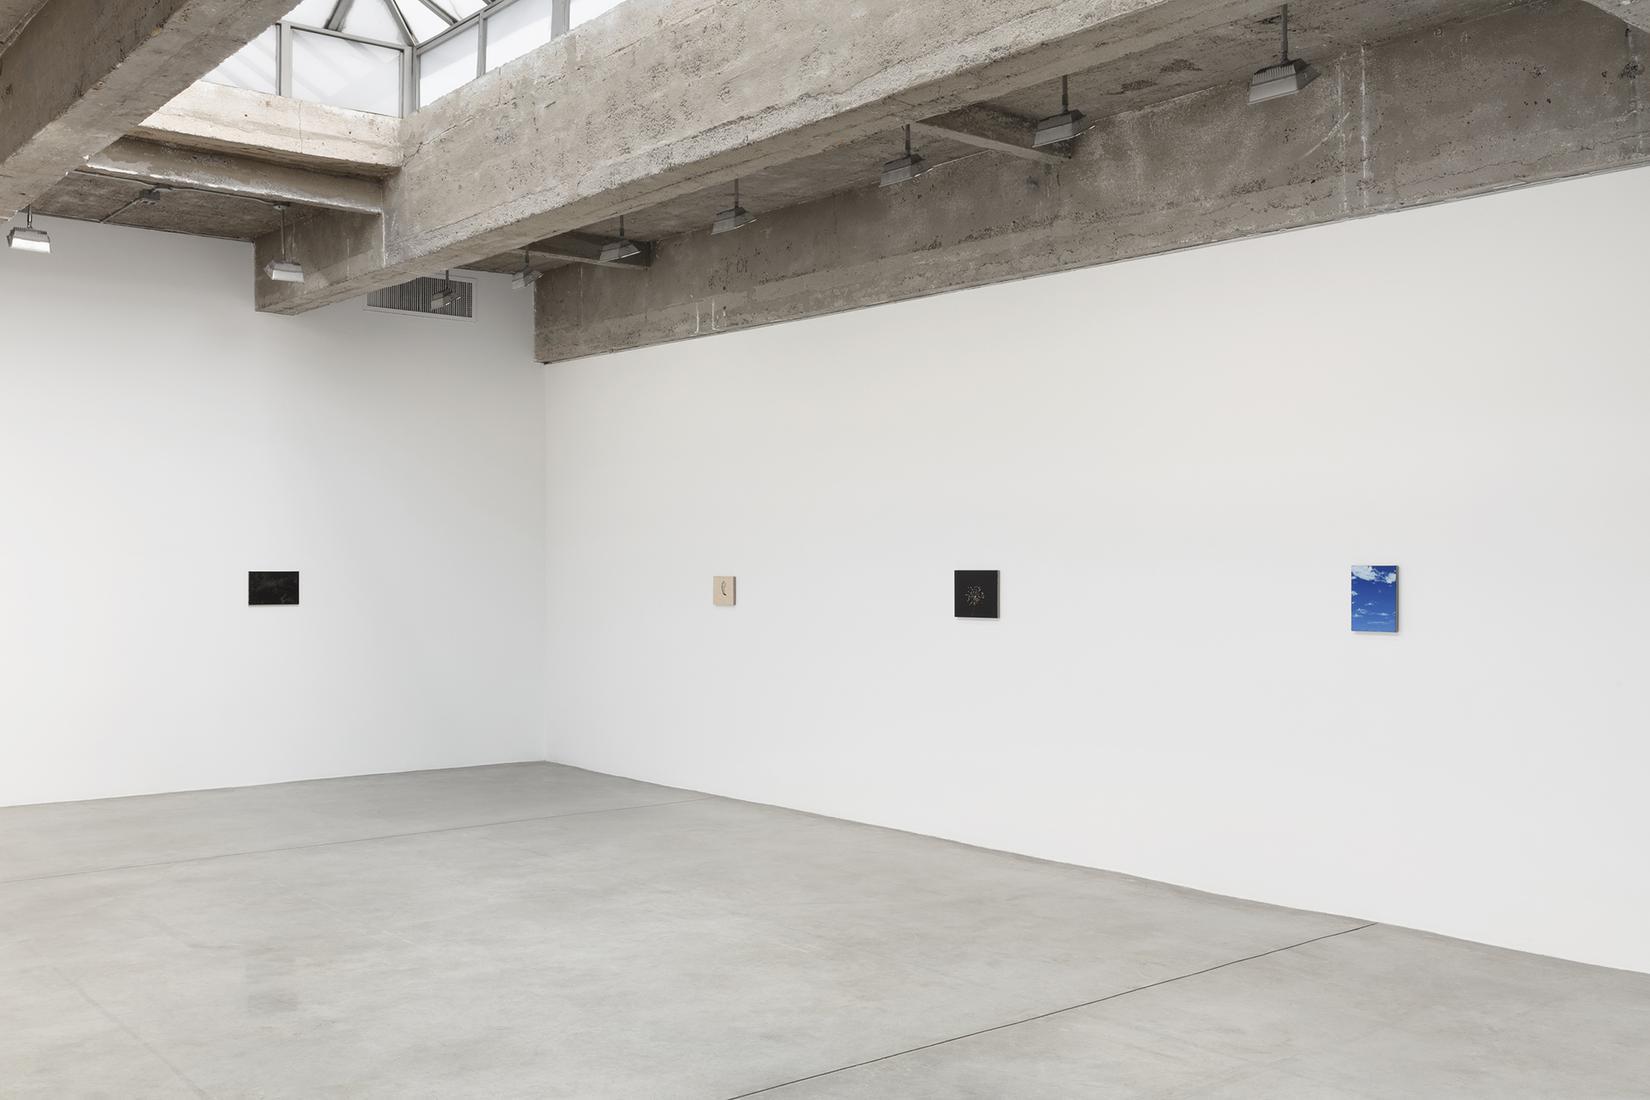 June 6 – July 26, 2019 -  - Dana Powell: Burner -  - Exhibitions